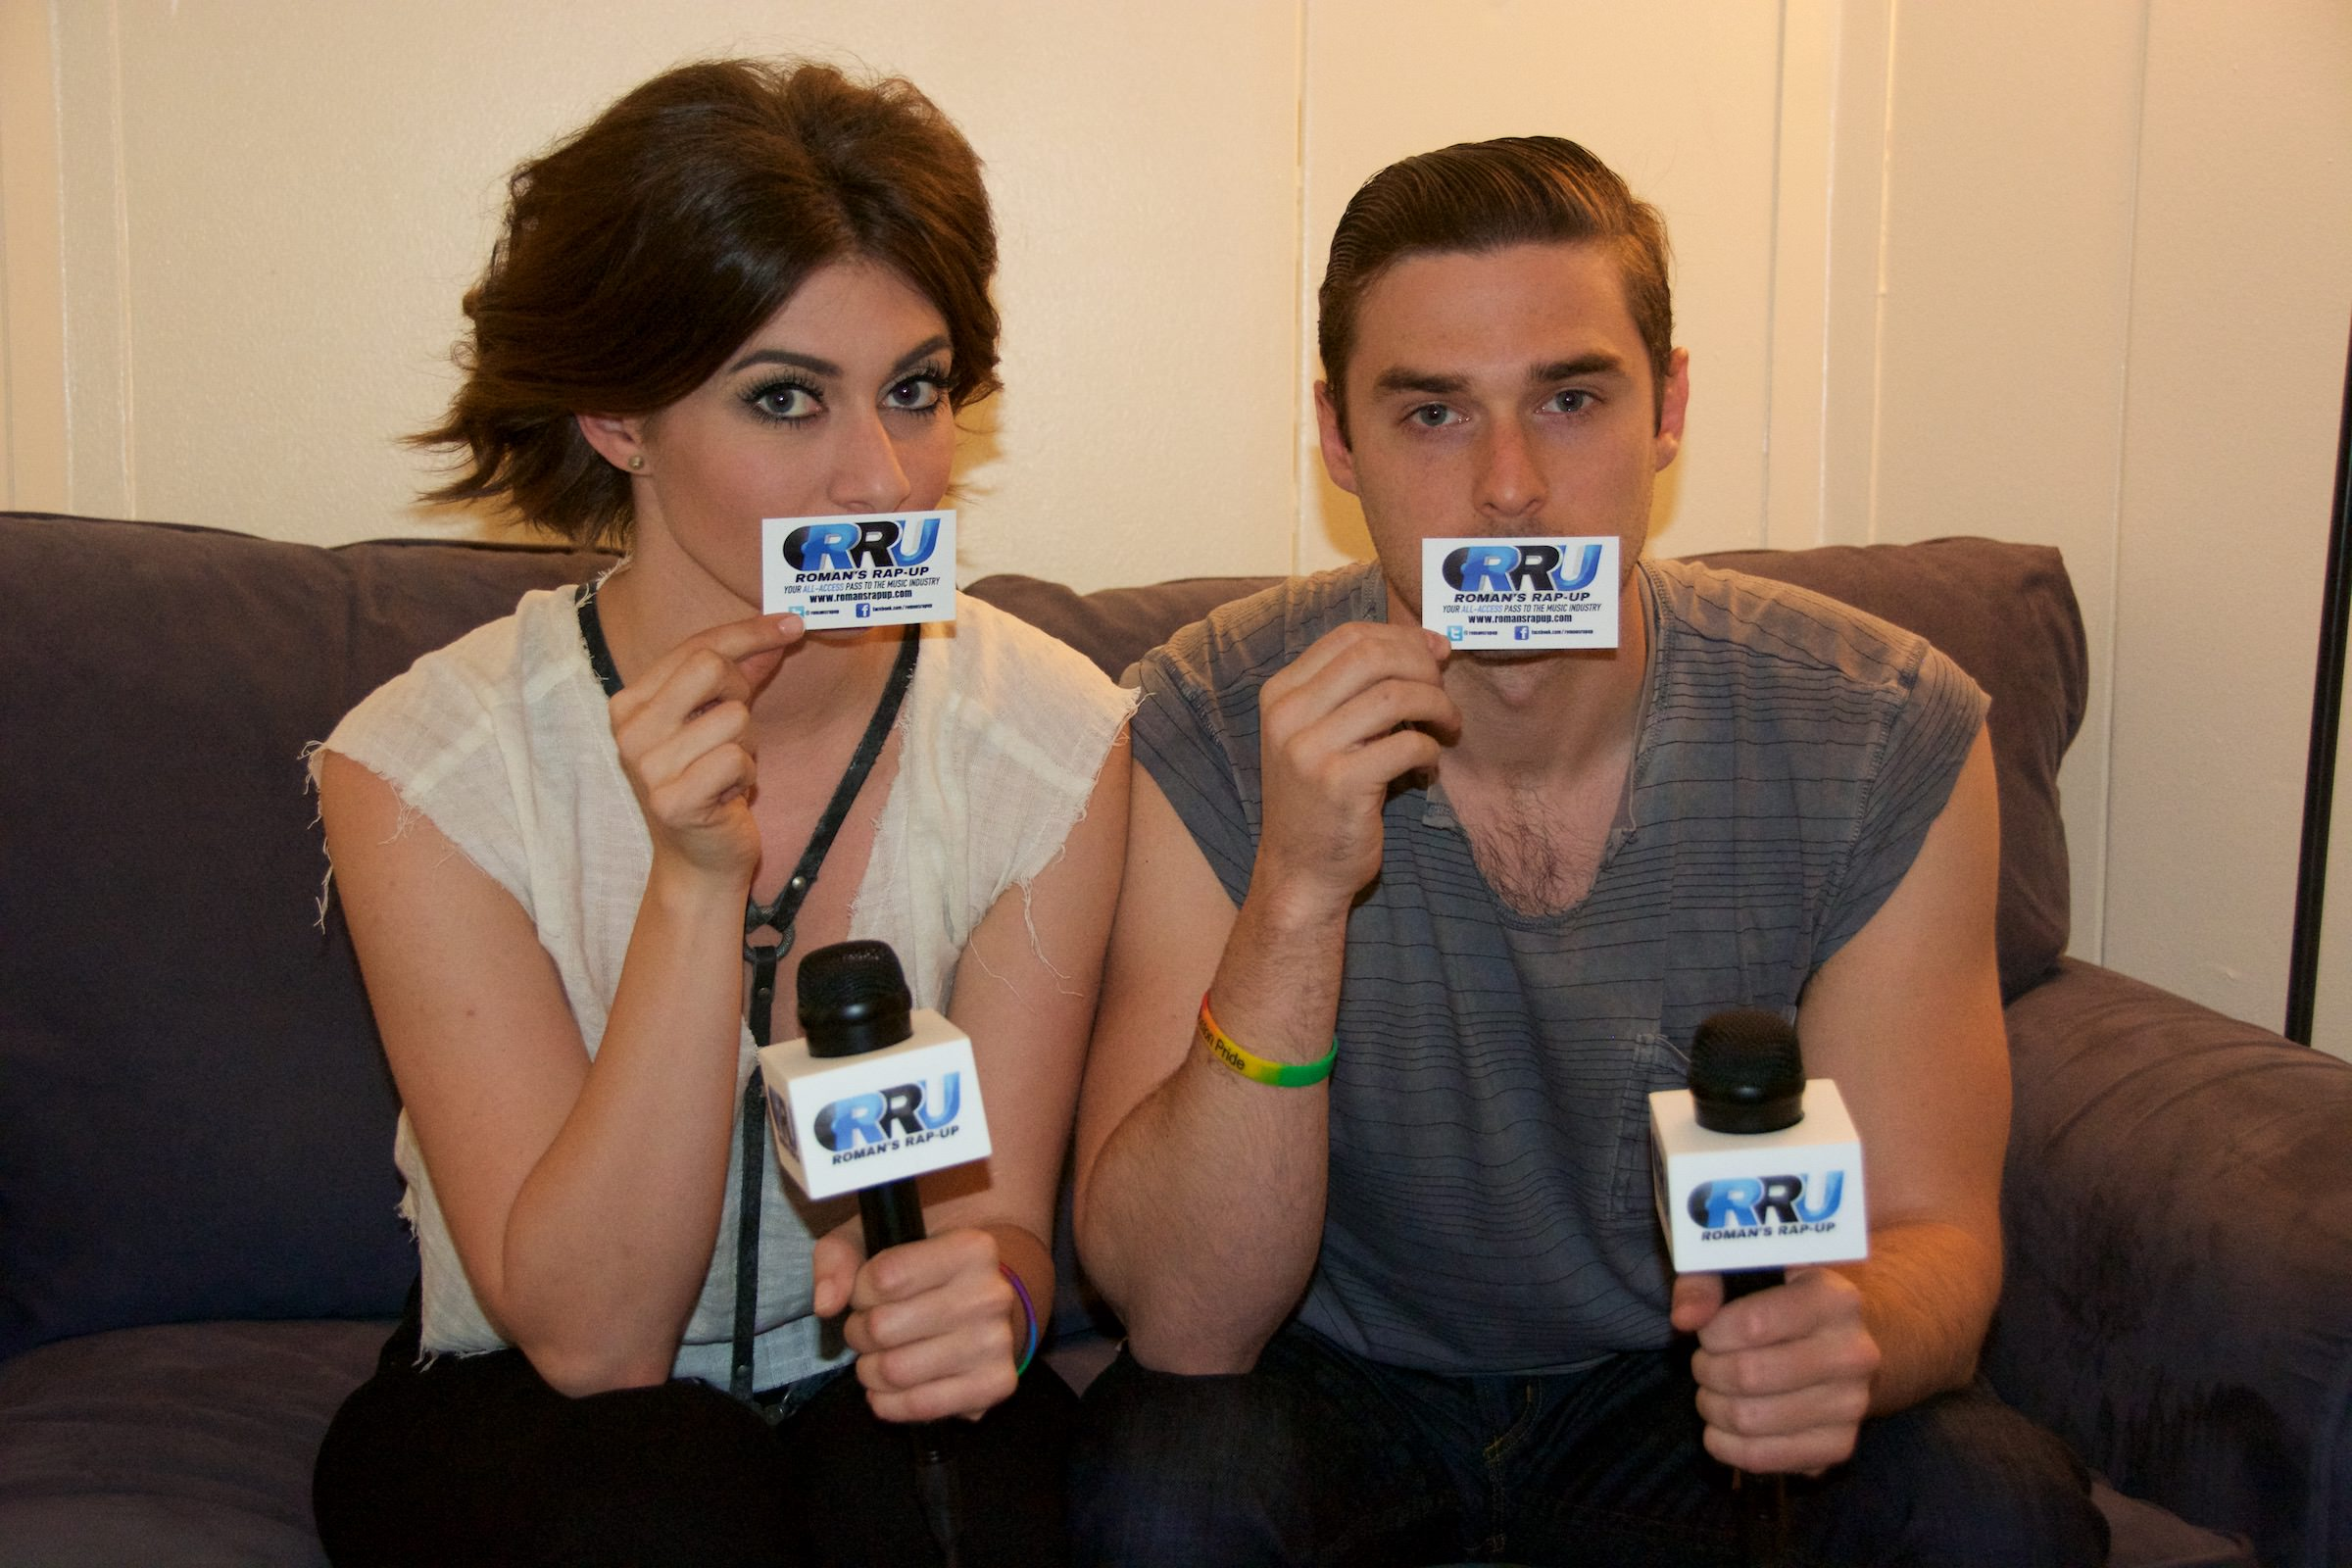 Amy Heidemann (left) and Nick Noonan (right) of Karmin pose for Roman's Rap-Up (Benjamin Esakof/Roman's Rap-Up).